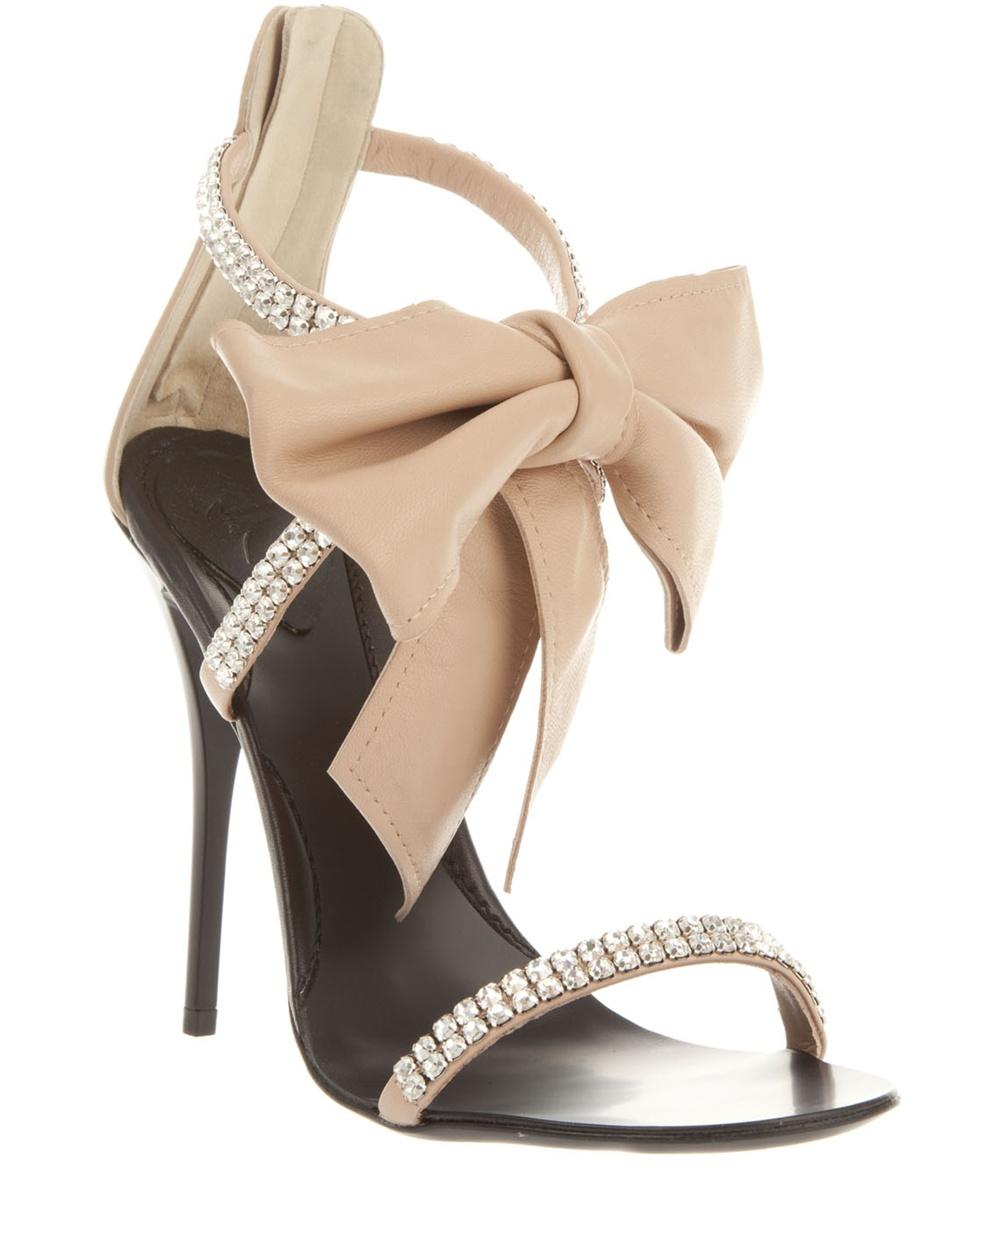 Shoes Shoes Shoes On Pinterest